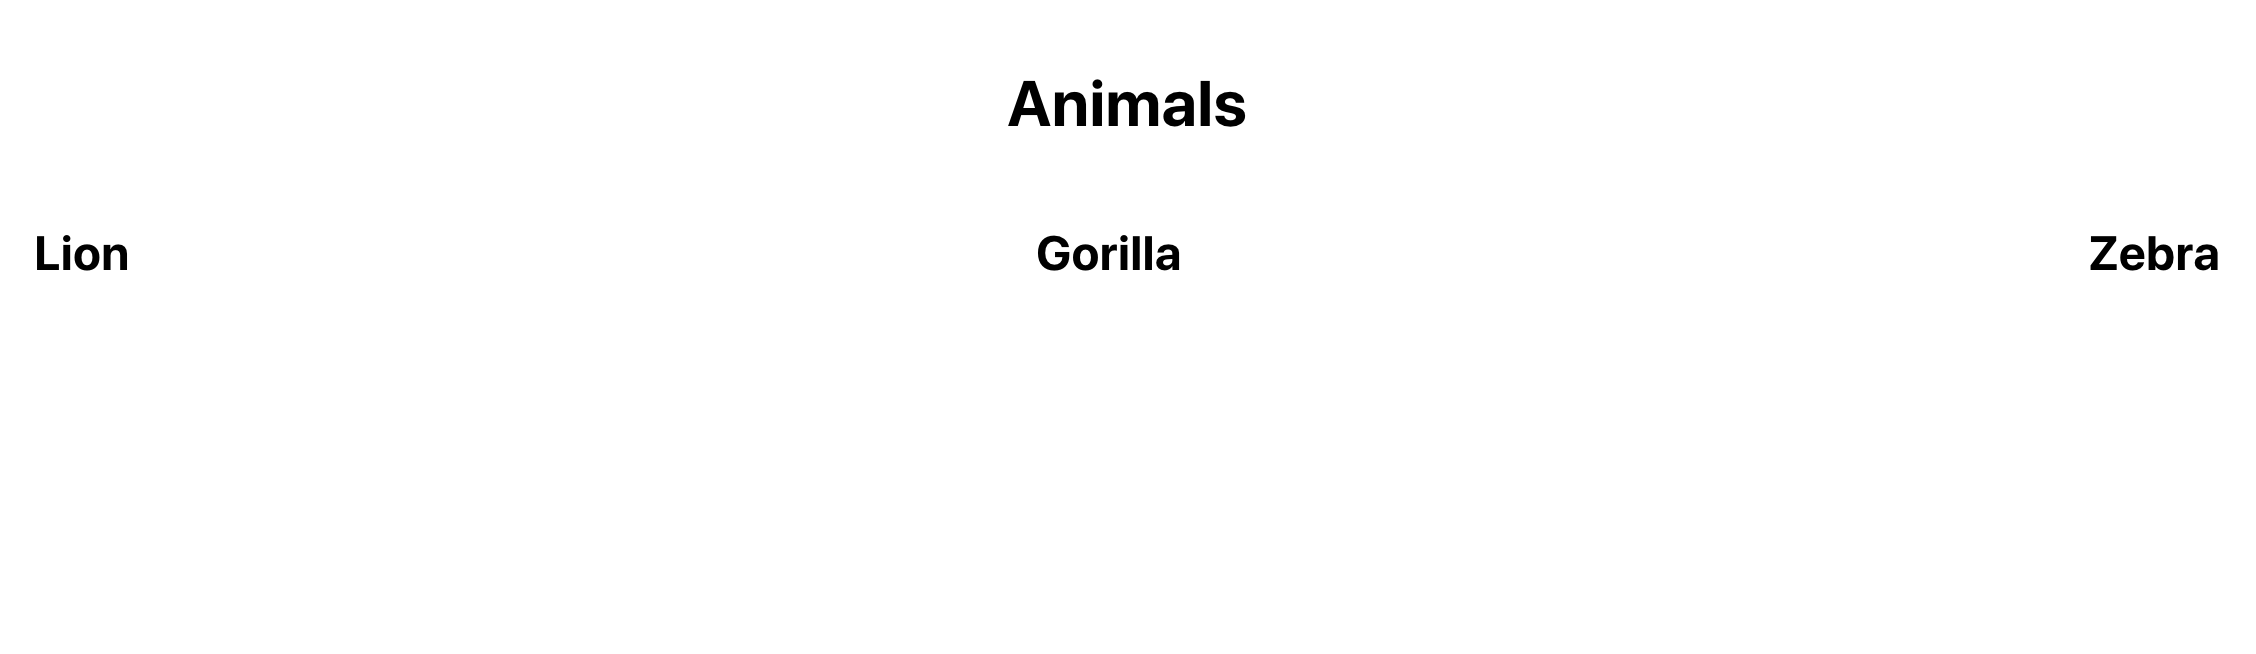 Proyectos React con nombres de animales representados